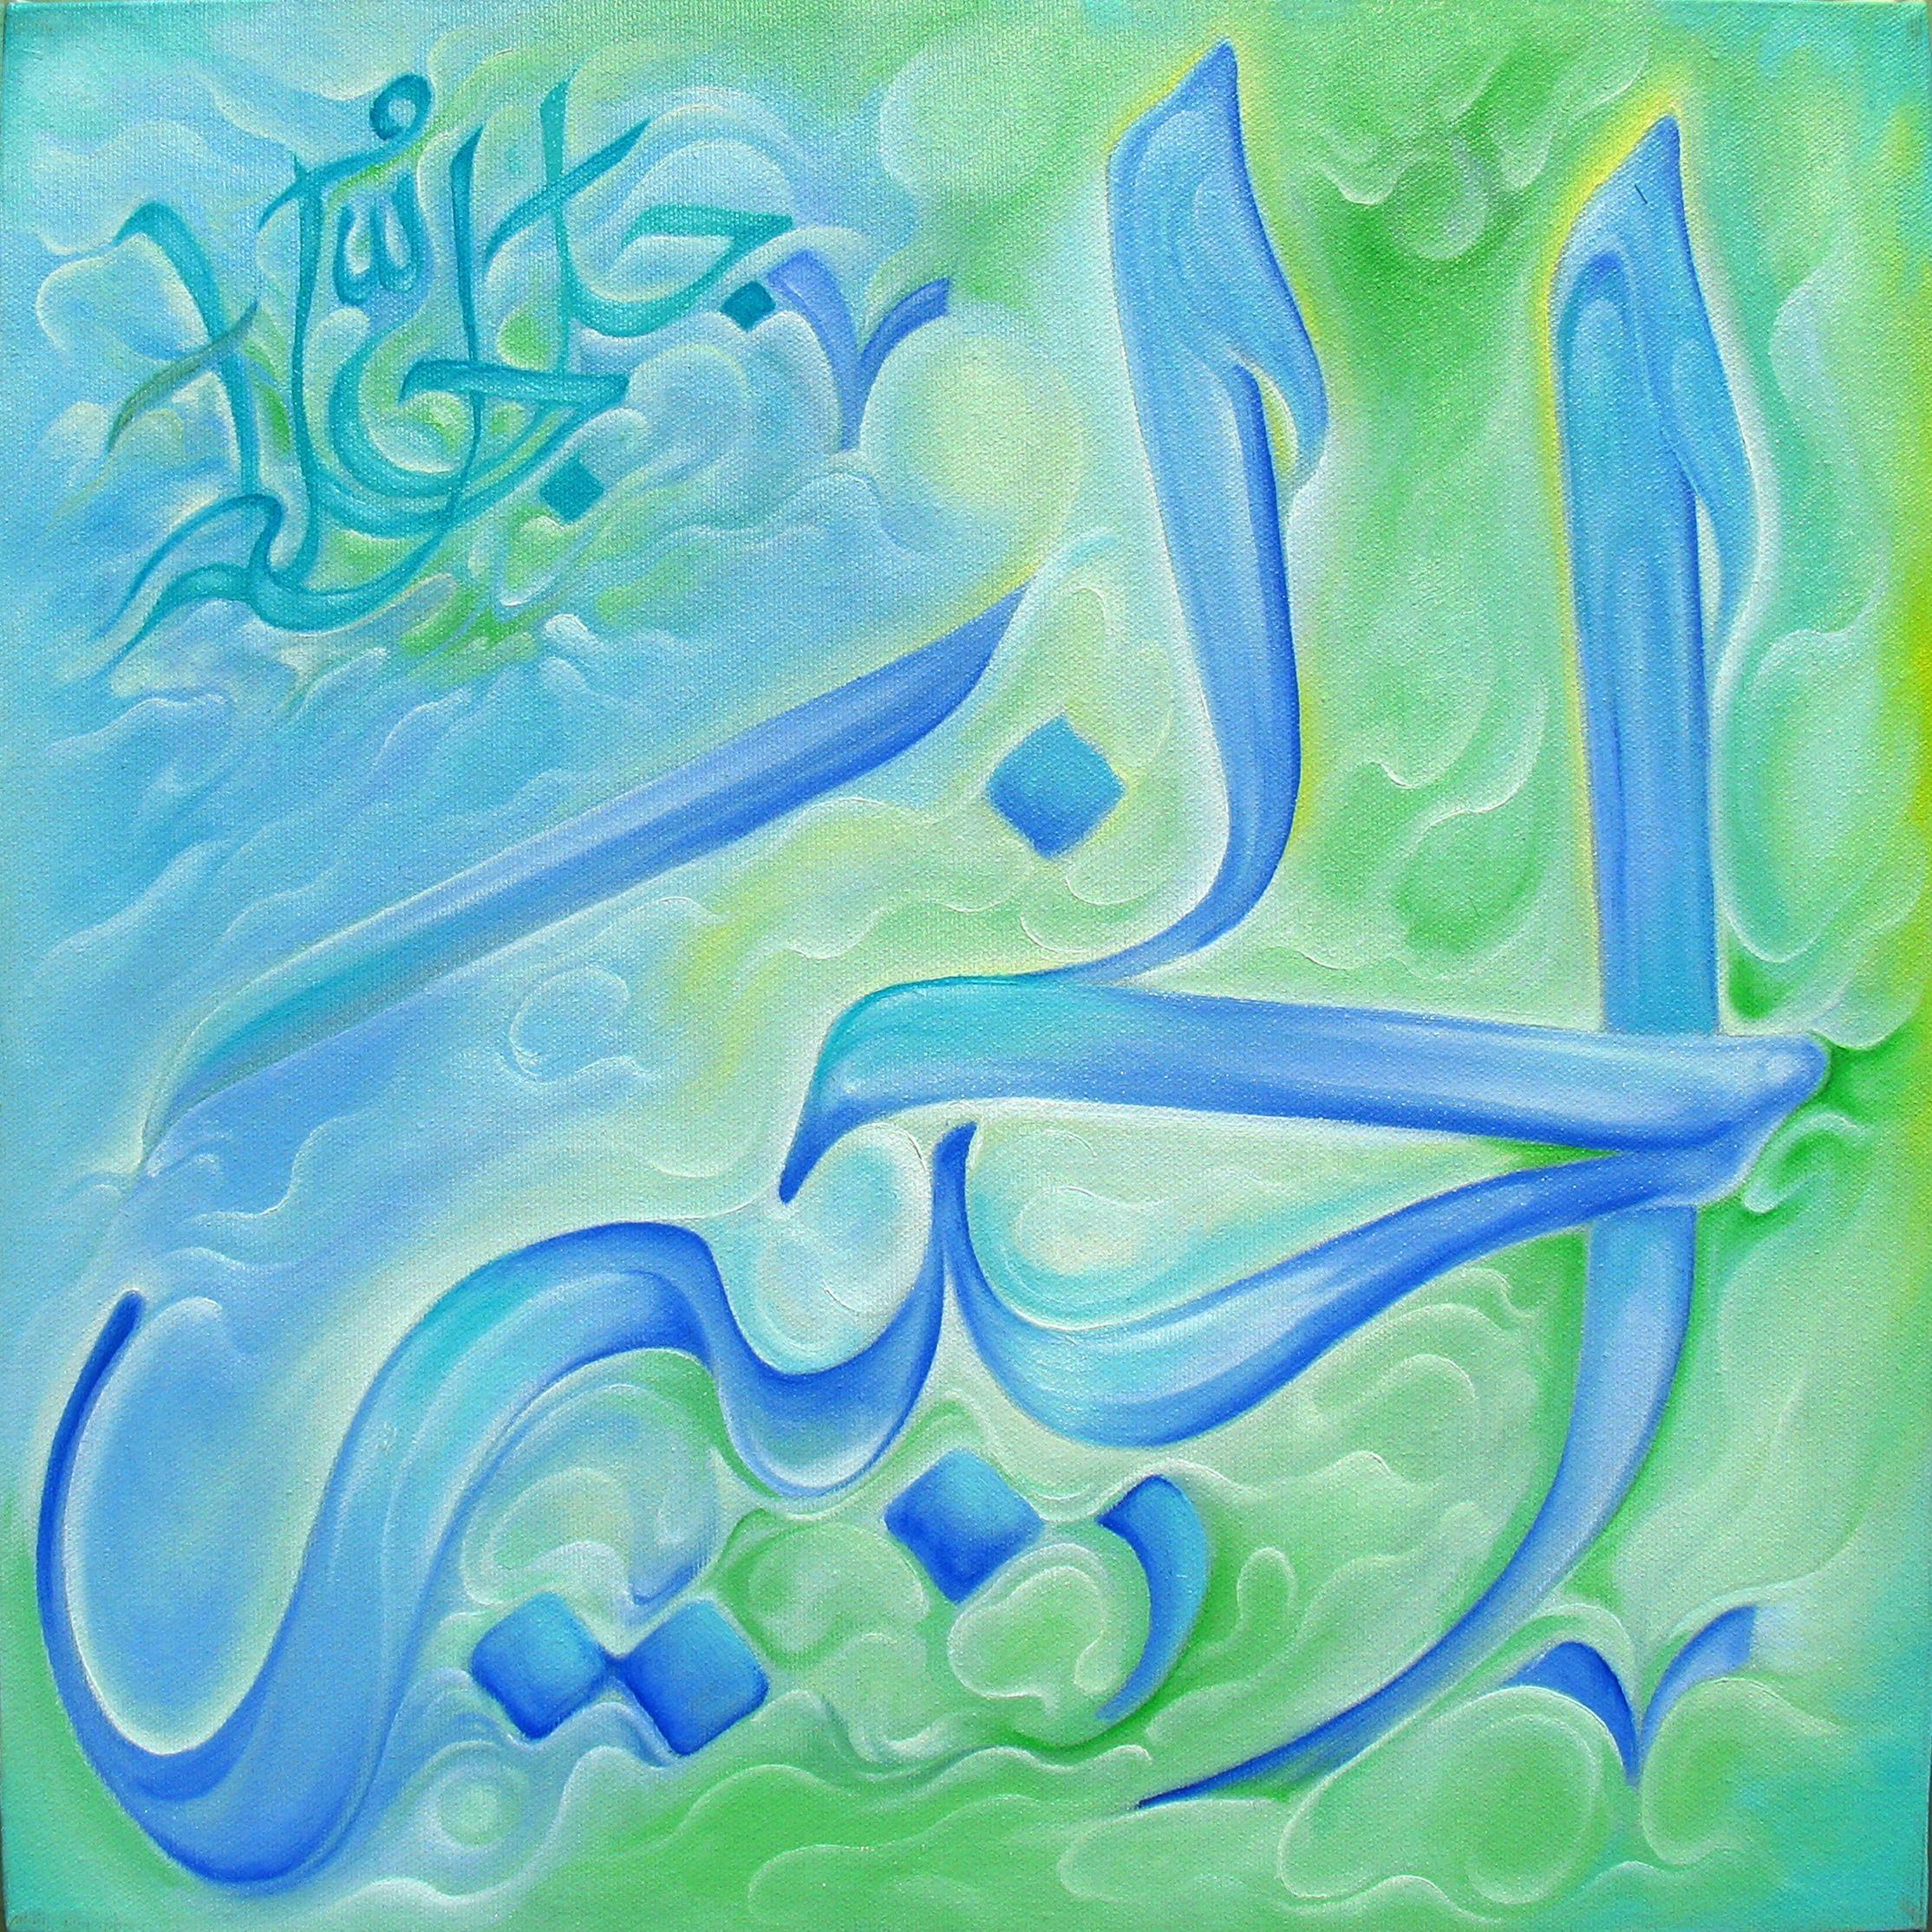 Pin oleh marwah .. di 99 name's of Allah/Isma ul Hasana